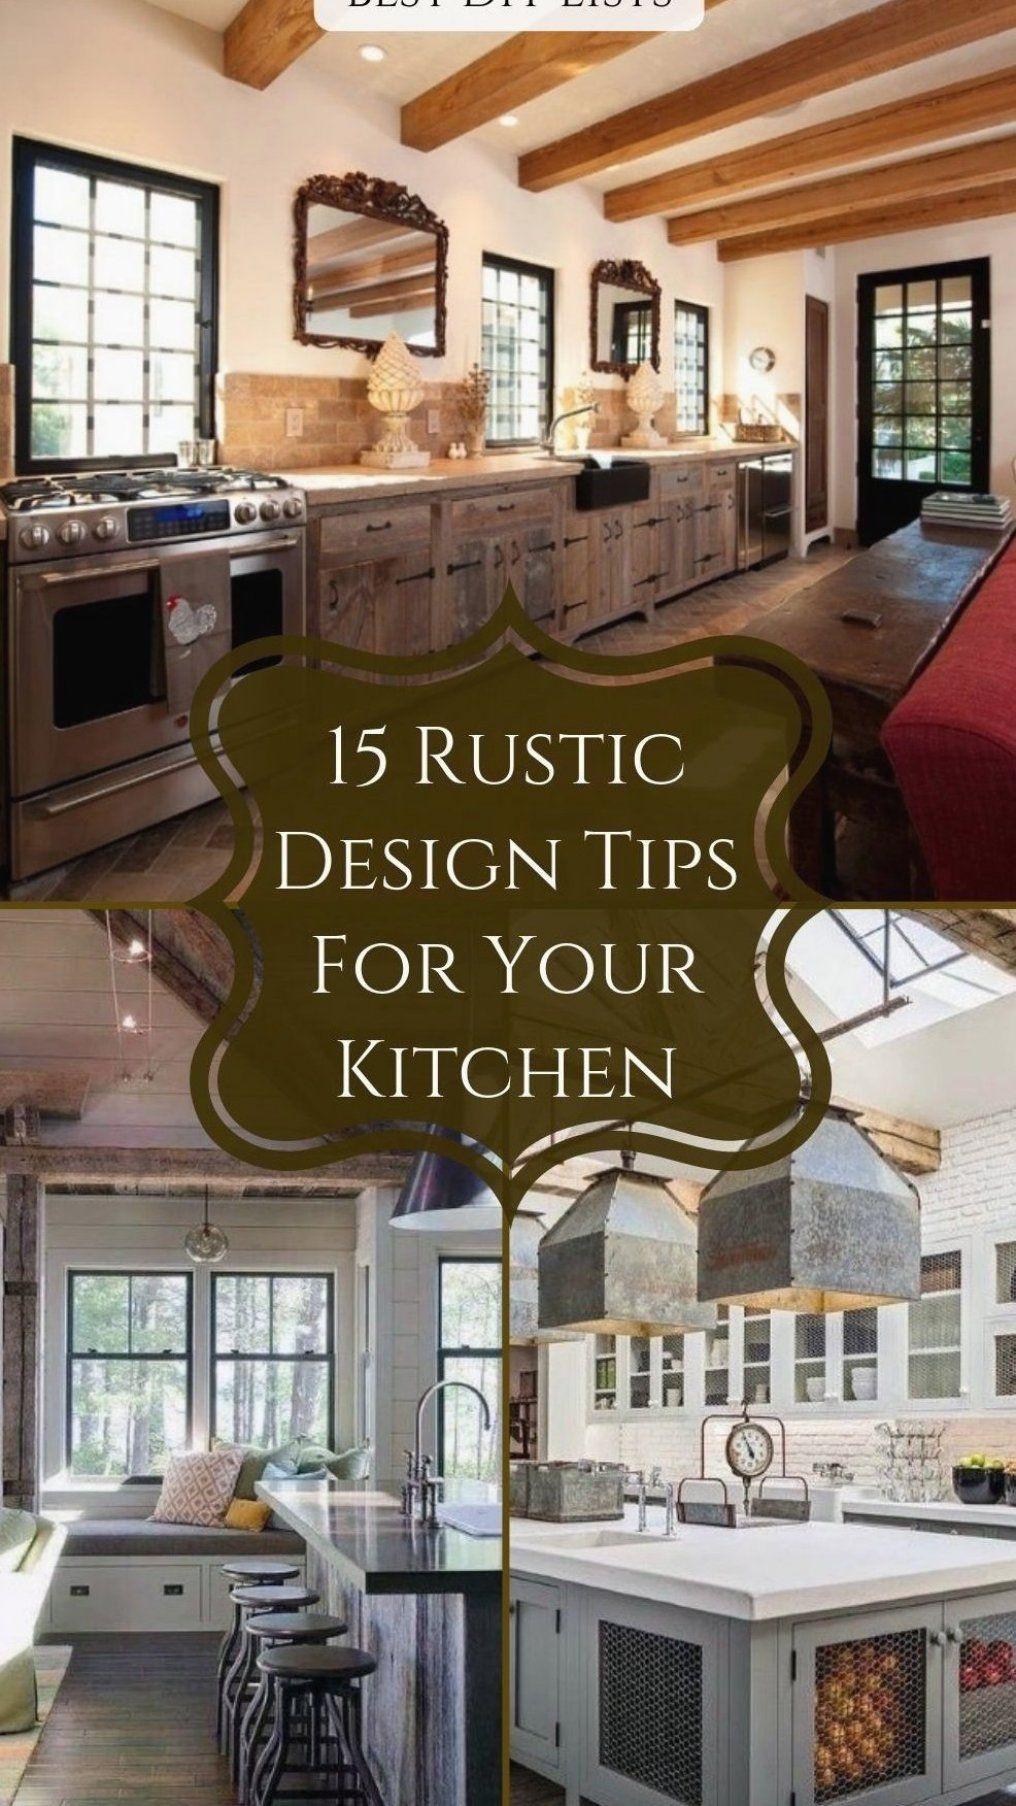 Kitchen Decor Ideas Themes Kitchen Decor With Mason Jars Hobby Lobby Kitchen Decor Pioneer Woman Kit In 2020 Rustic Kitchen Decor Rustic Kitchen Home Remodeling Diy